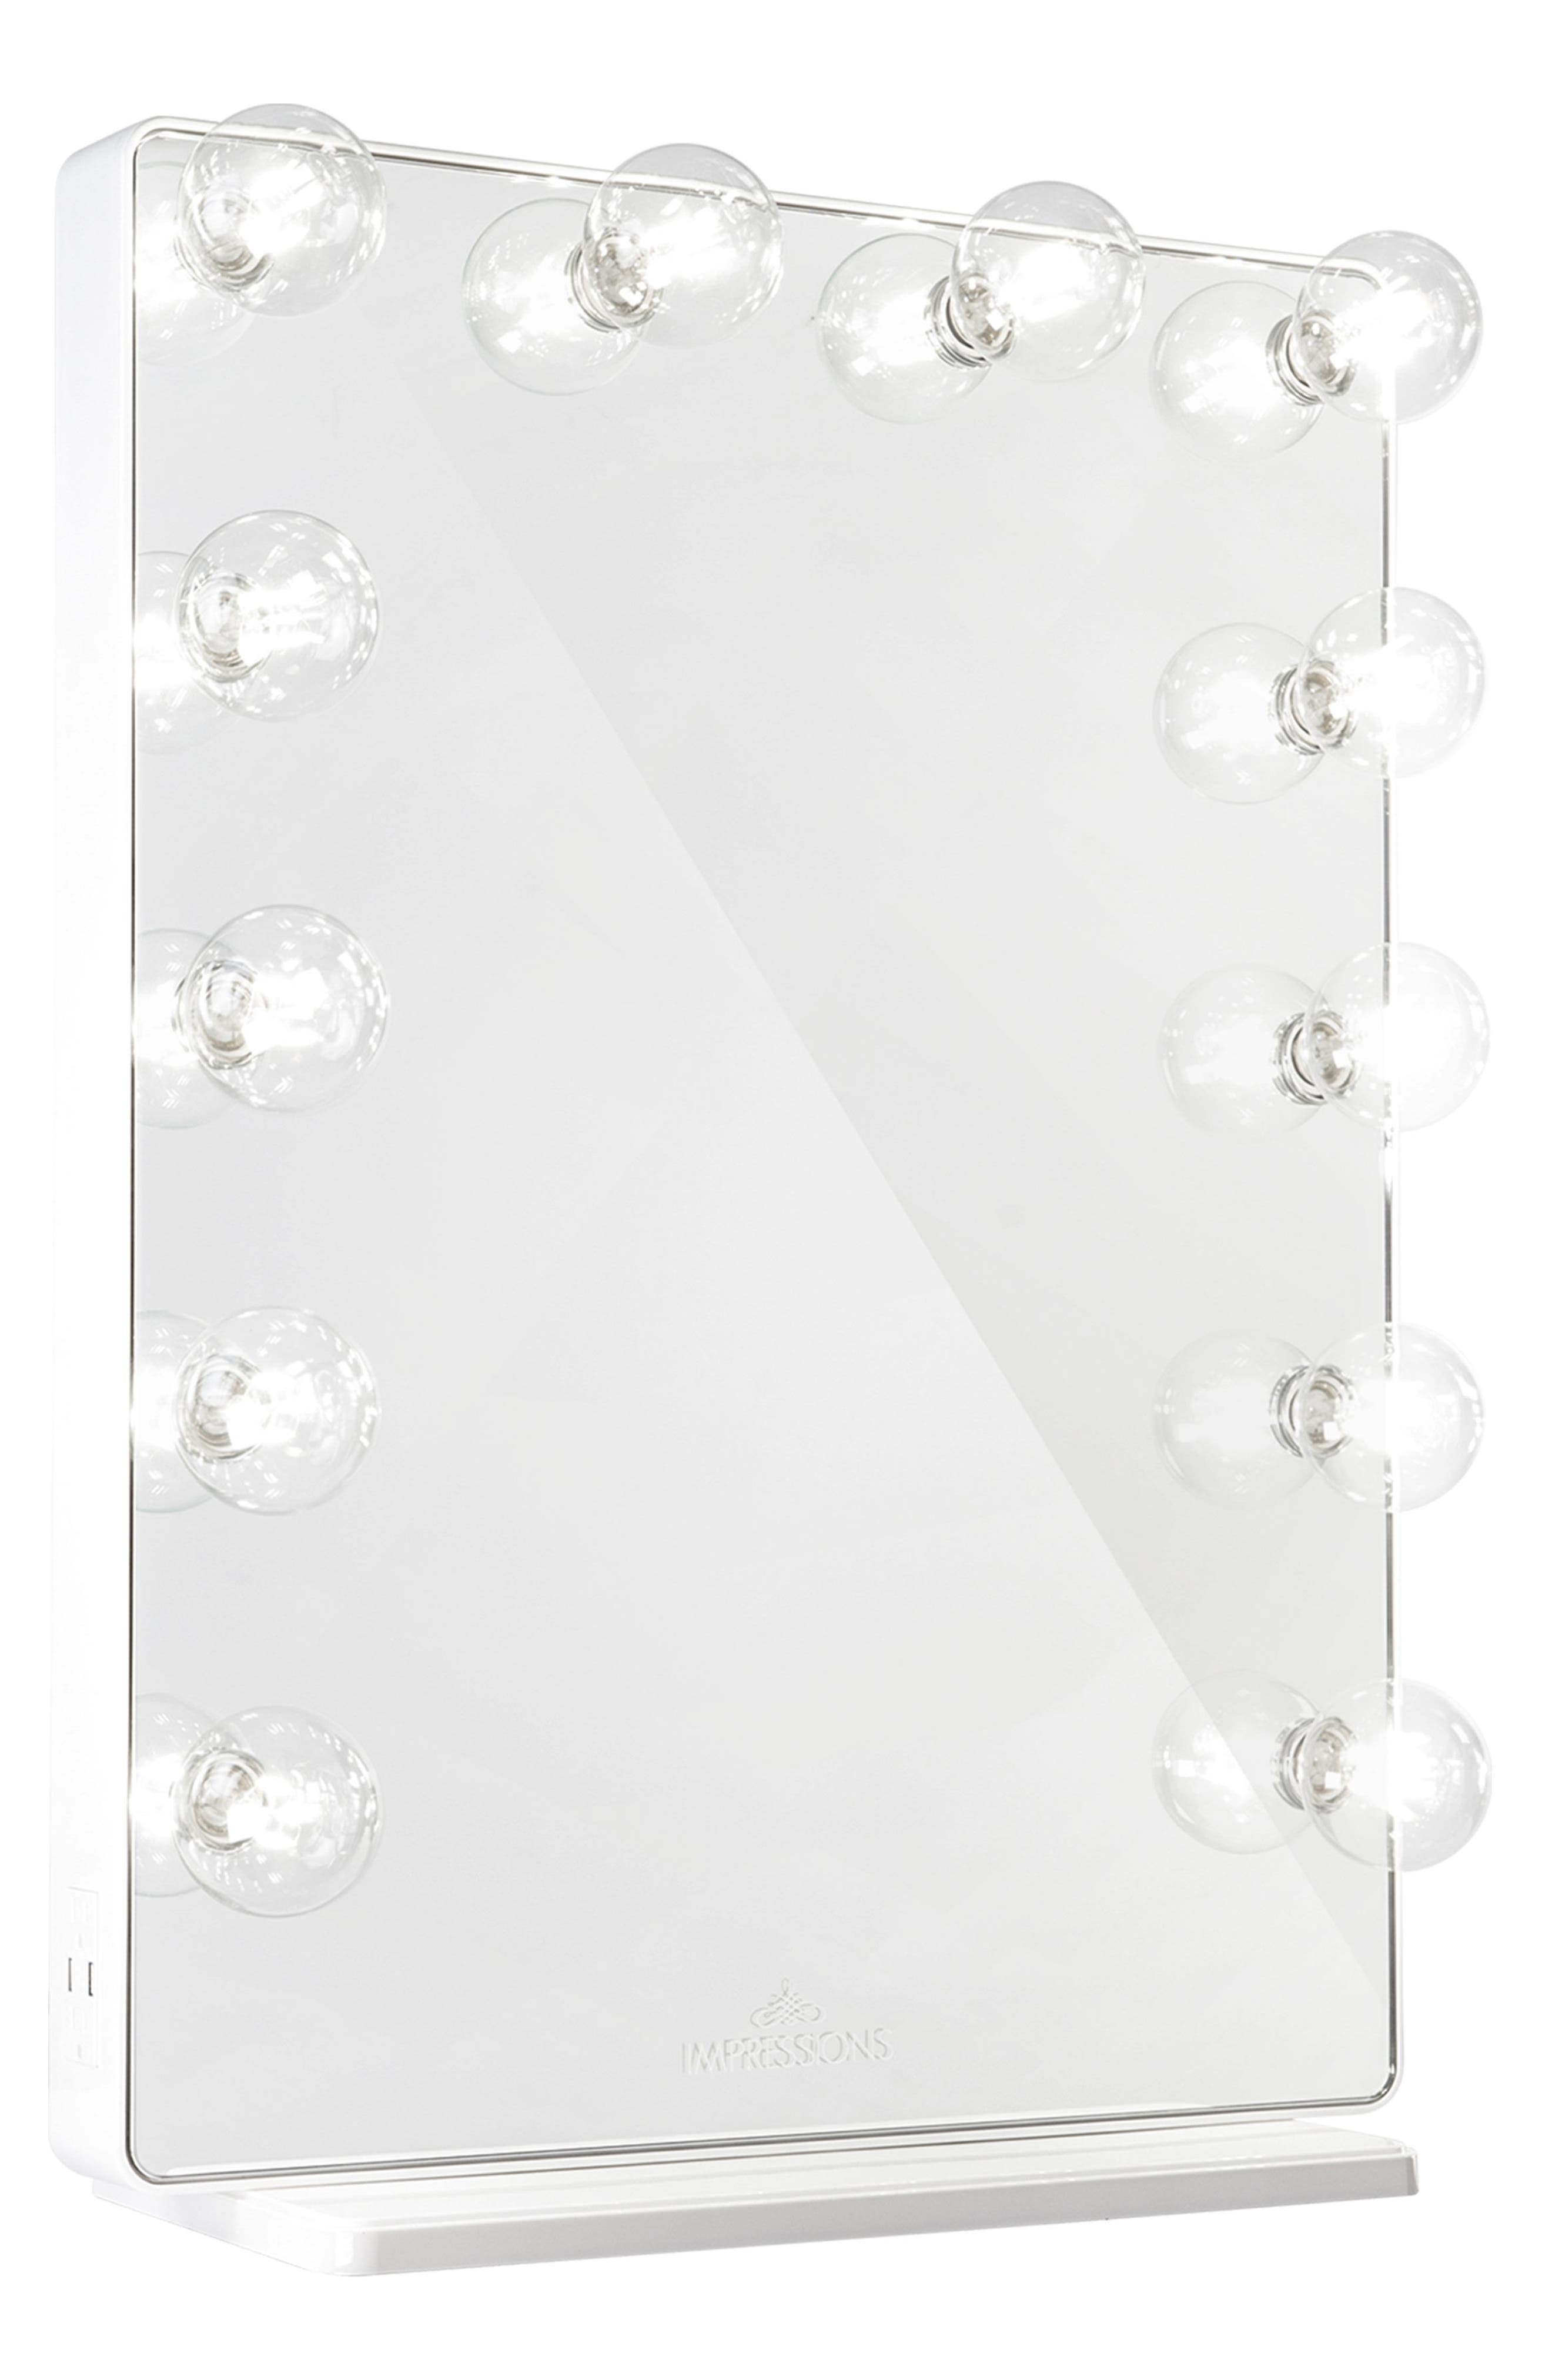 Hollywood Glow<sup>®</sup> XL 2.0 Vanity Mirror,                             Main thumbnail 1, color,                             White